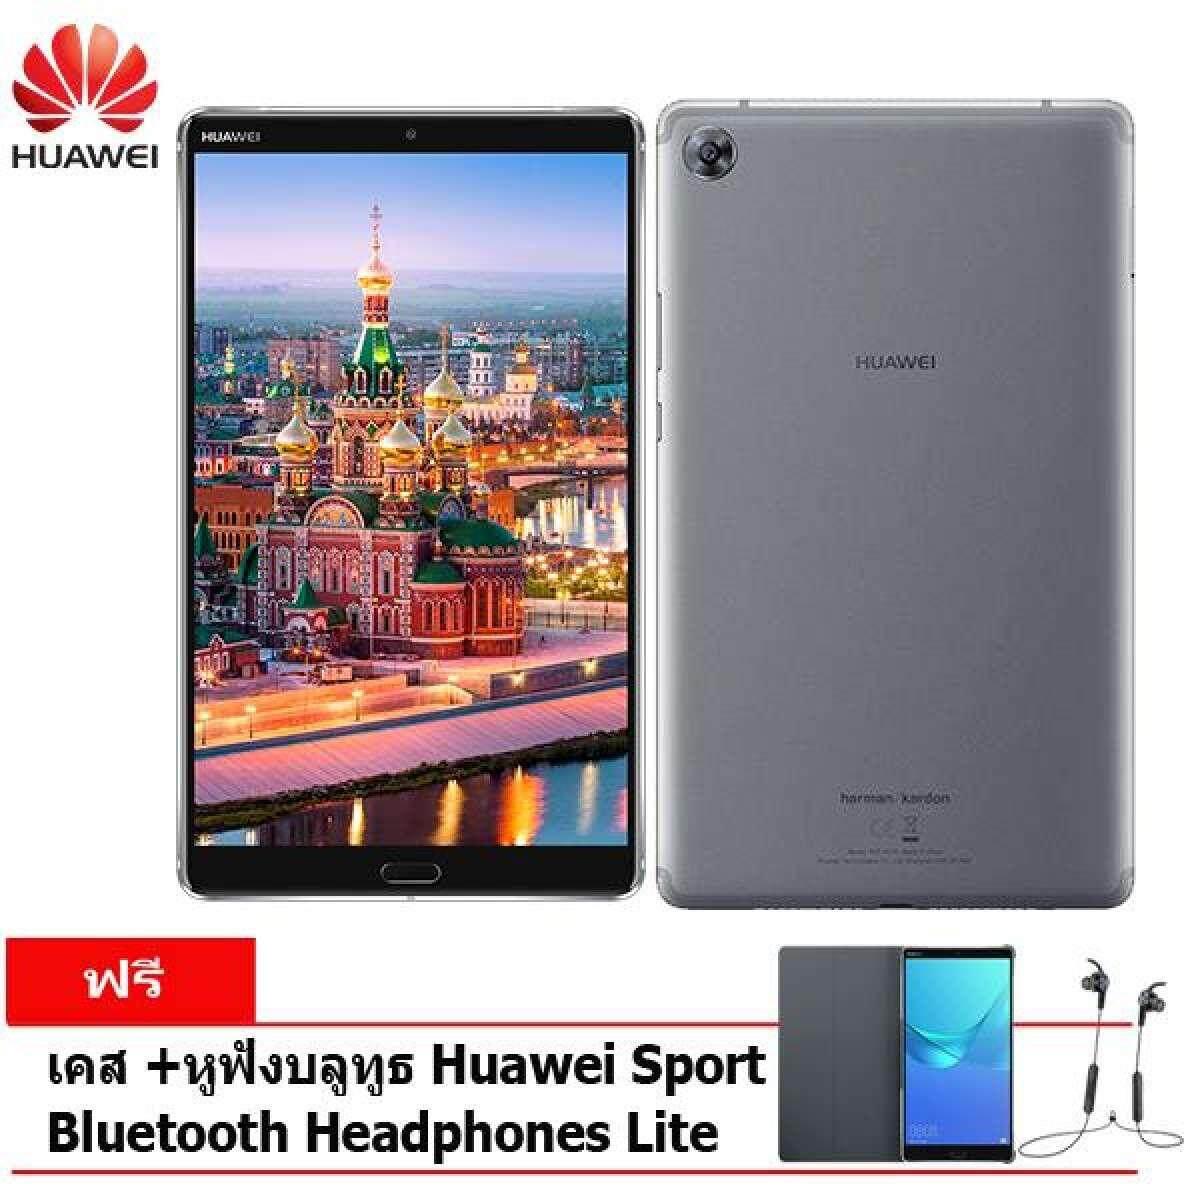 Huawei MediaPad M5 - Free Huawei Sport Bluetooth Headphones Lite + Case + Film กระจกนิรภัย